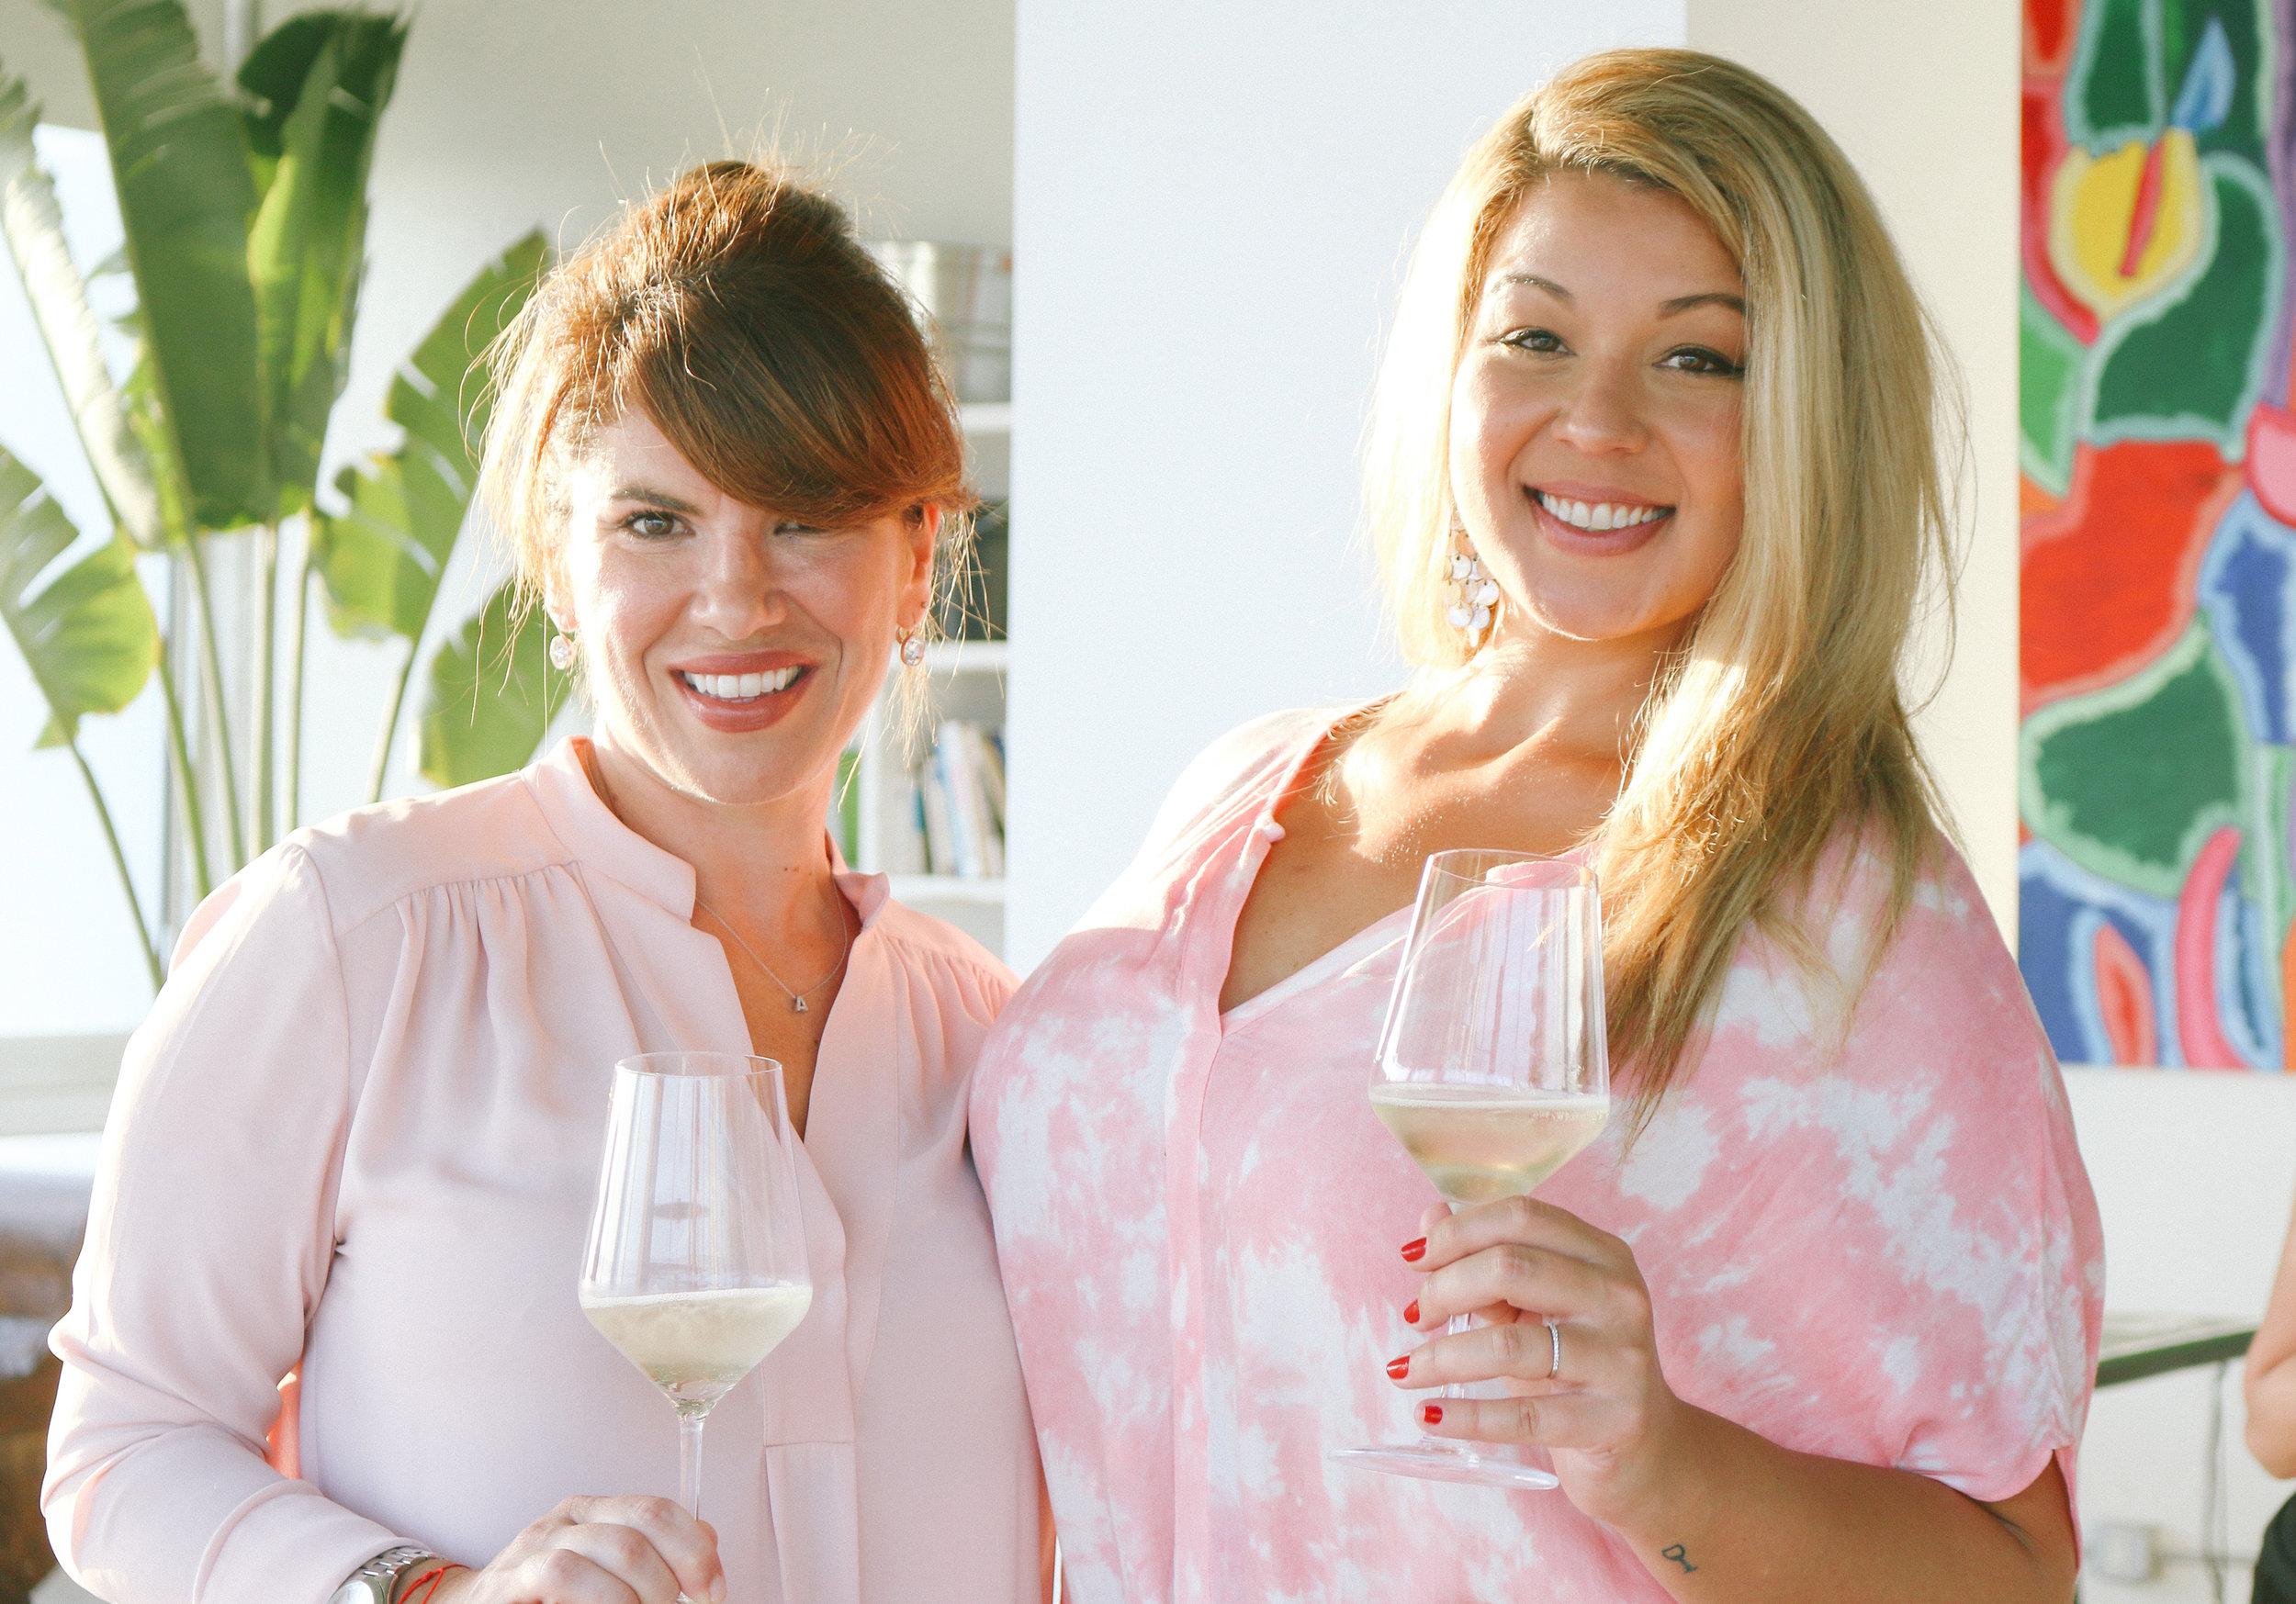 Women Who Wine Uncorked Conversations-Miami Wine Events-Wine Tasting Miami-14.jpg